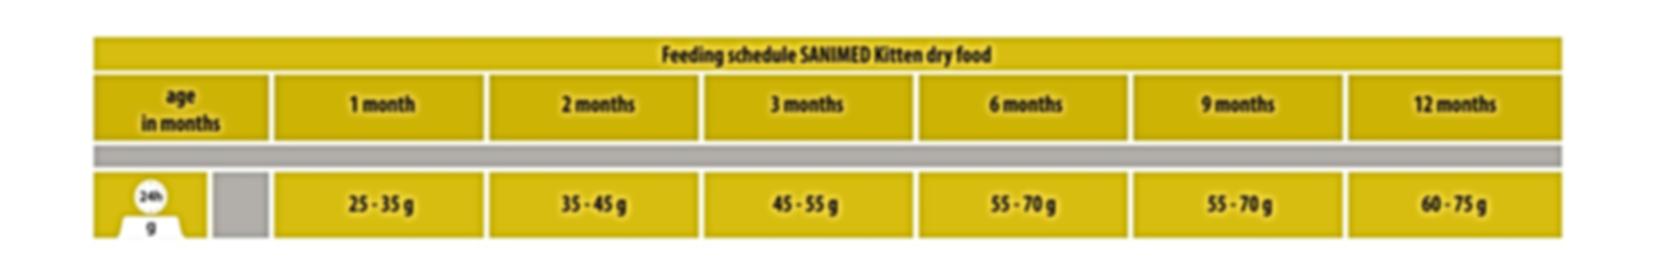 Kitten Feeding Schedule.png